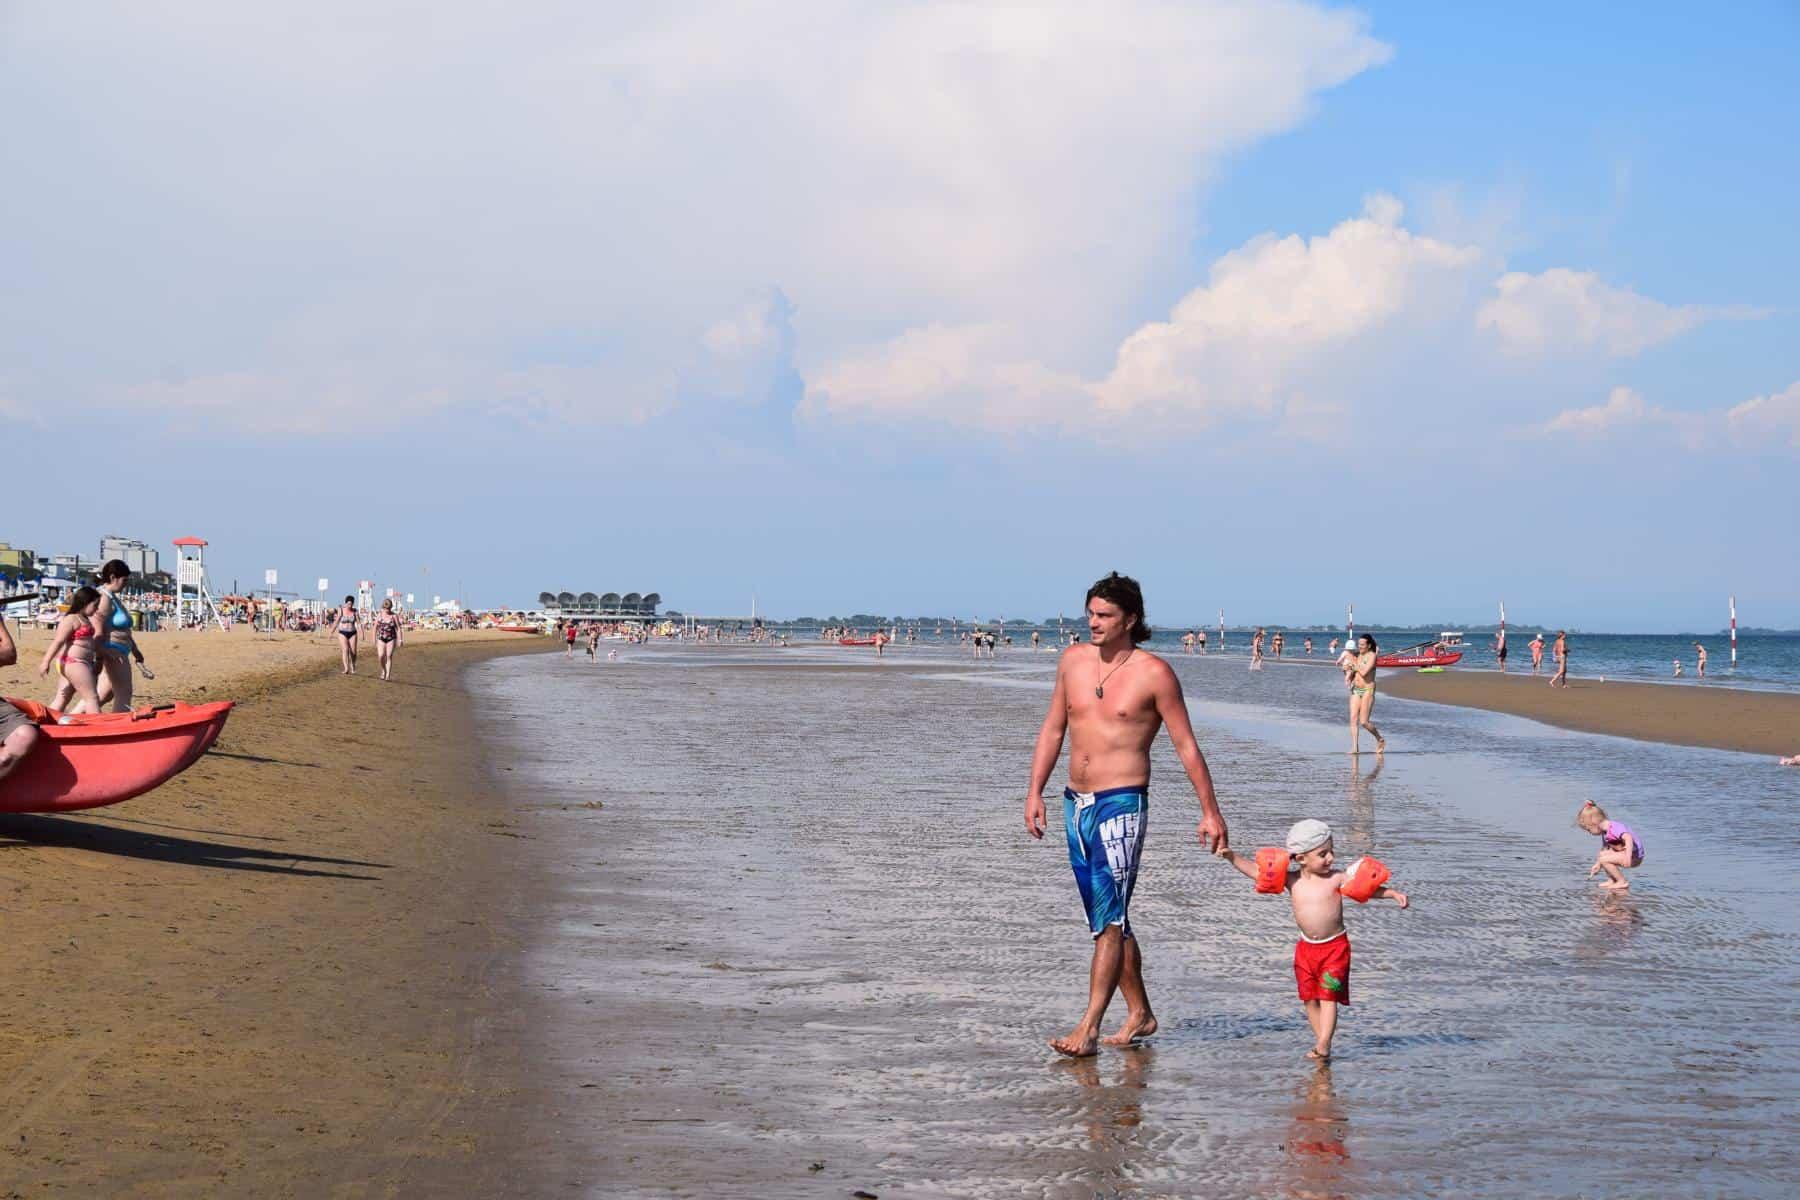 000 Lignano Sabbiadoro Strandurlaub Italien Adria